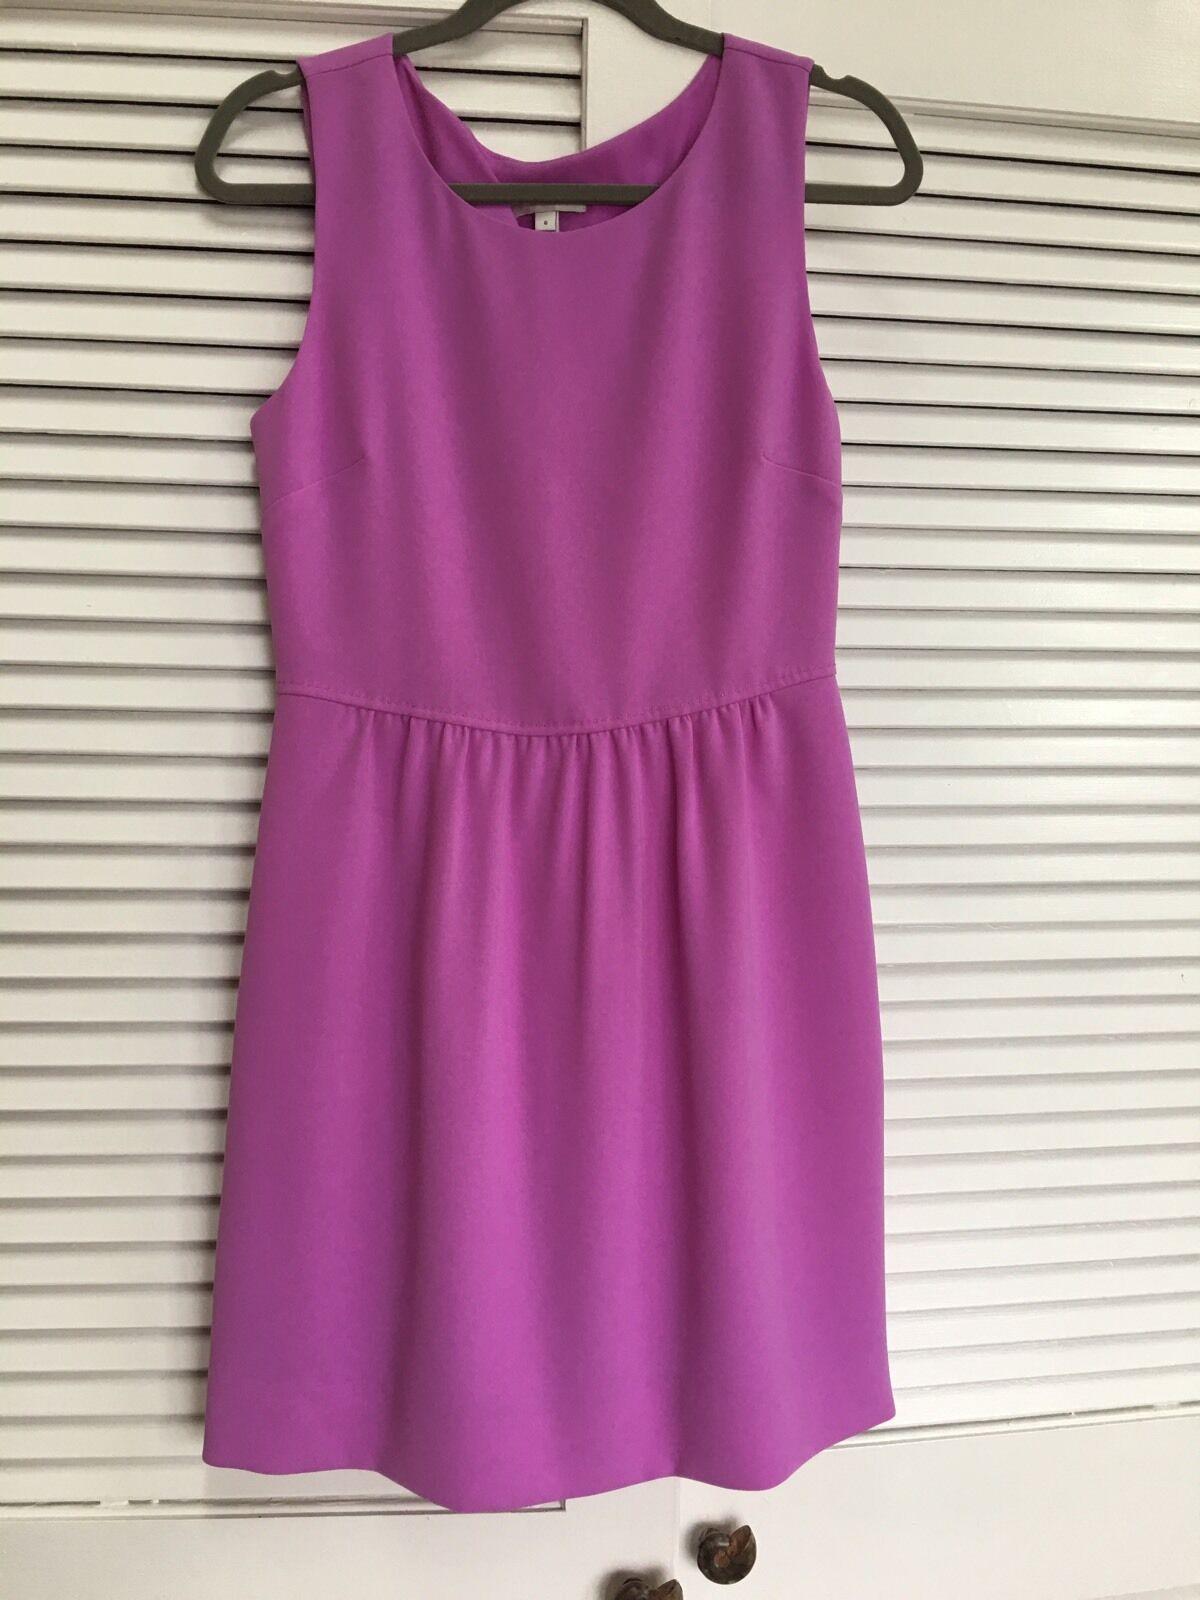 J. Crew Camille lila Lilac Matte Crepe Sleeveless Dress Sz 6